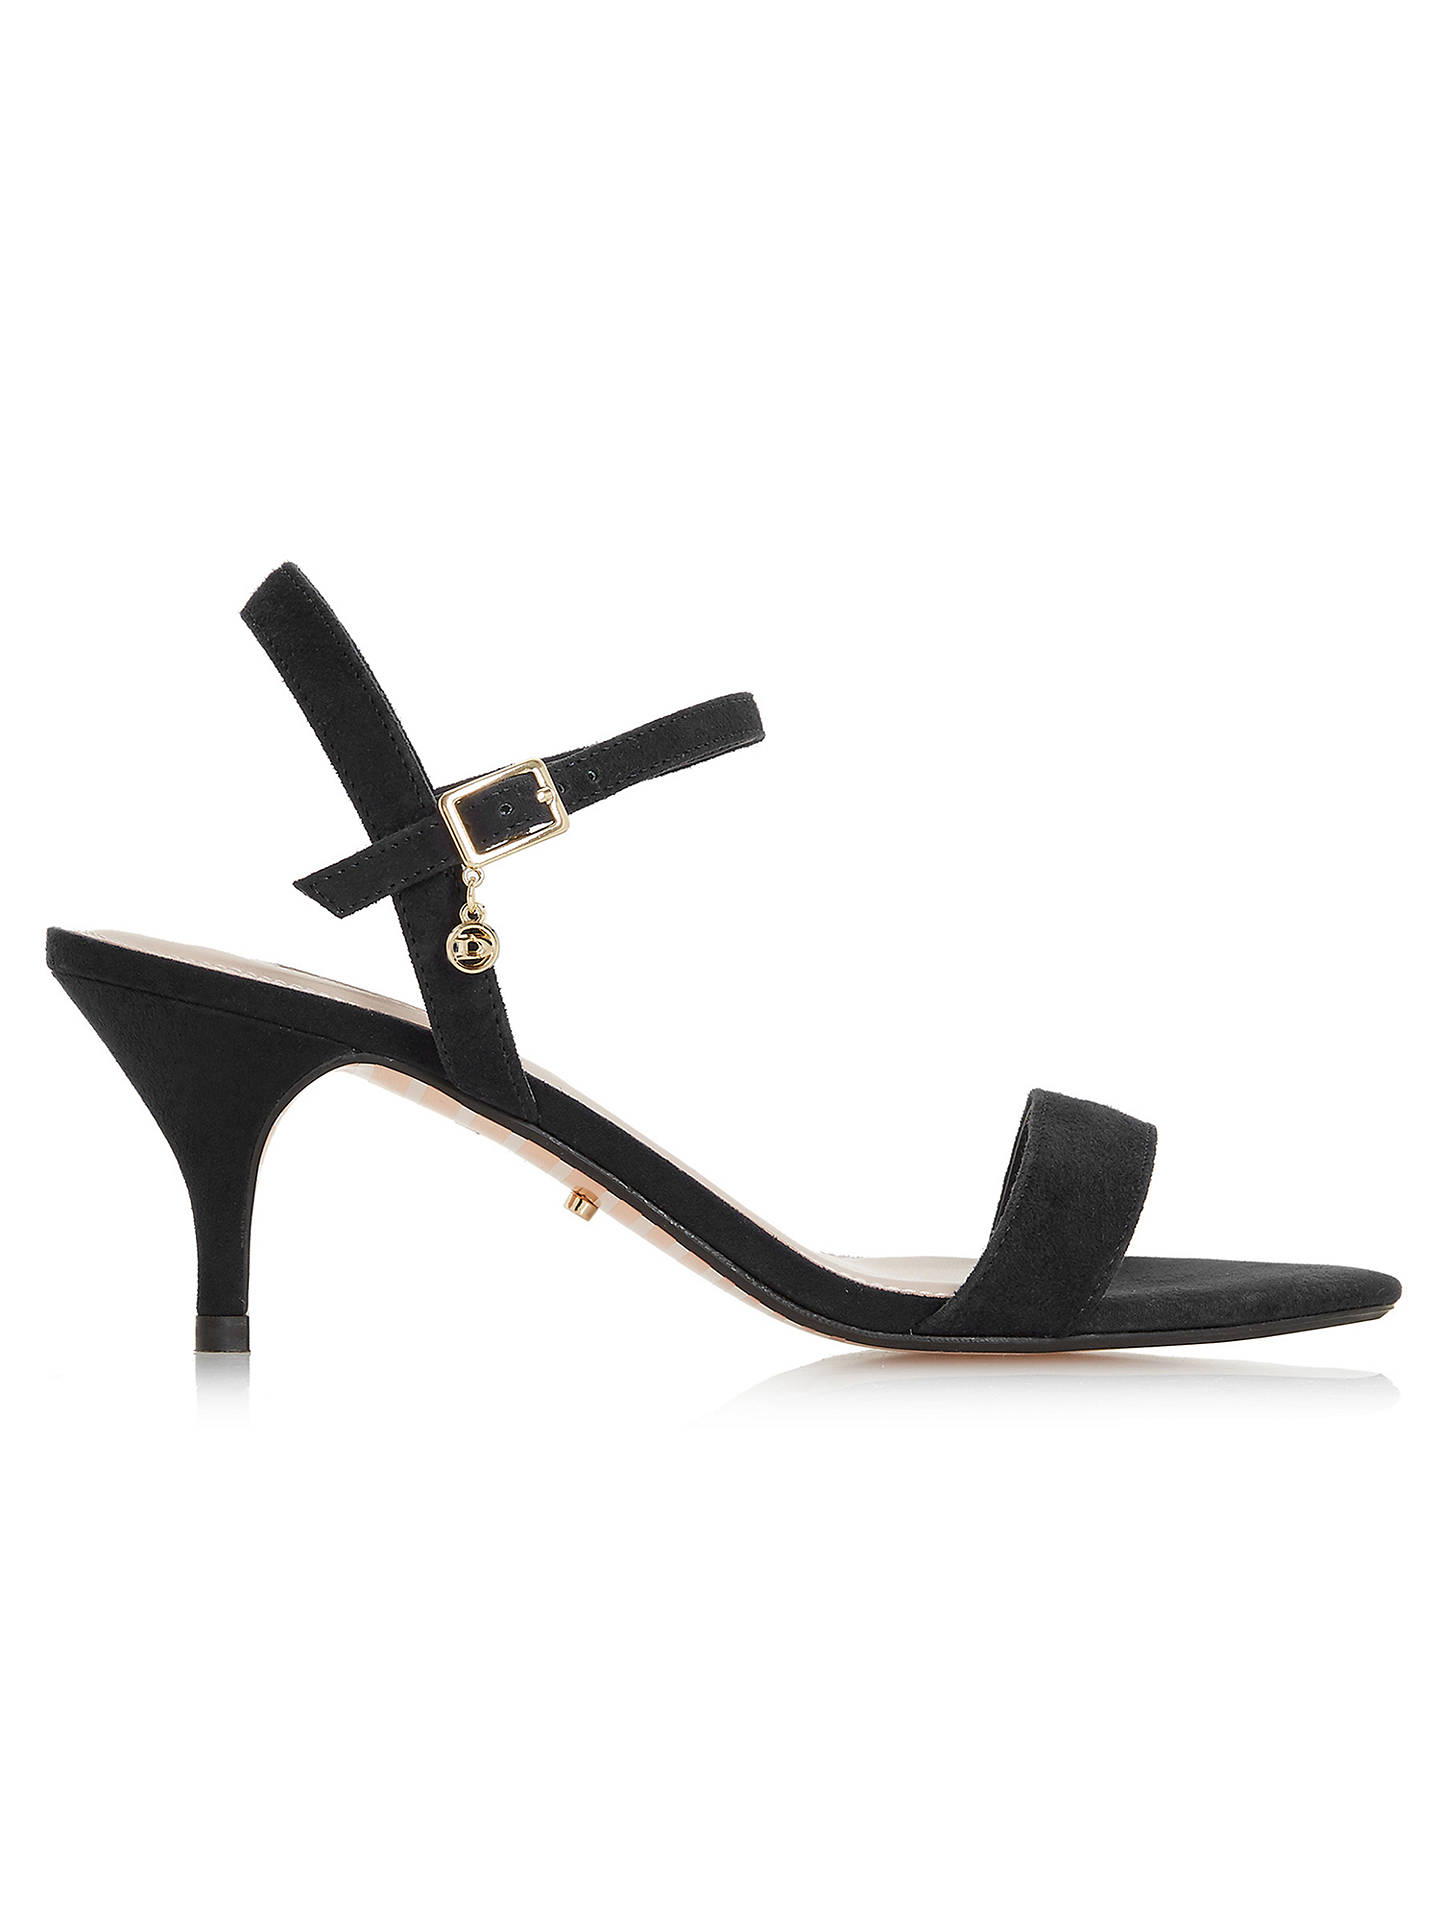 38b82b8df Gucci 9.5 Black Monogram Canvas & Suede Kitten Heel Sandals. BuyDune  Monnroe Two Part Kitten Heel Sandals, Black Suede, 3 Online at johnlewis.